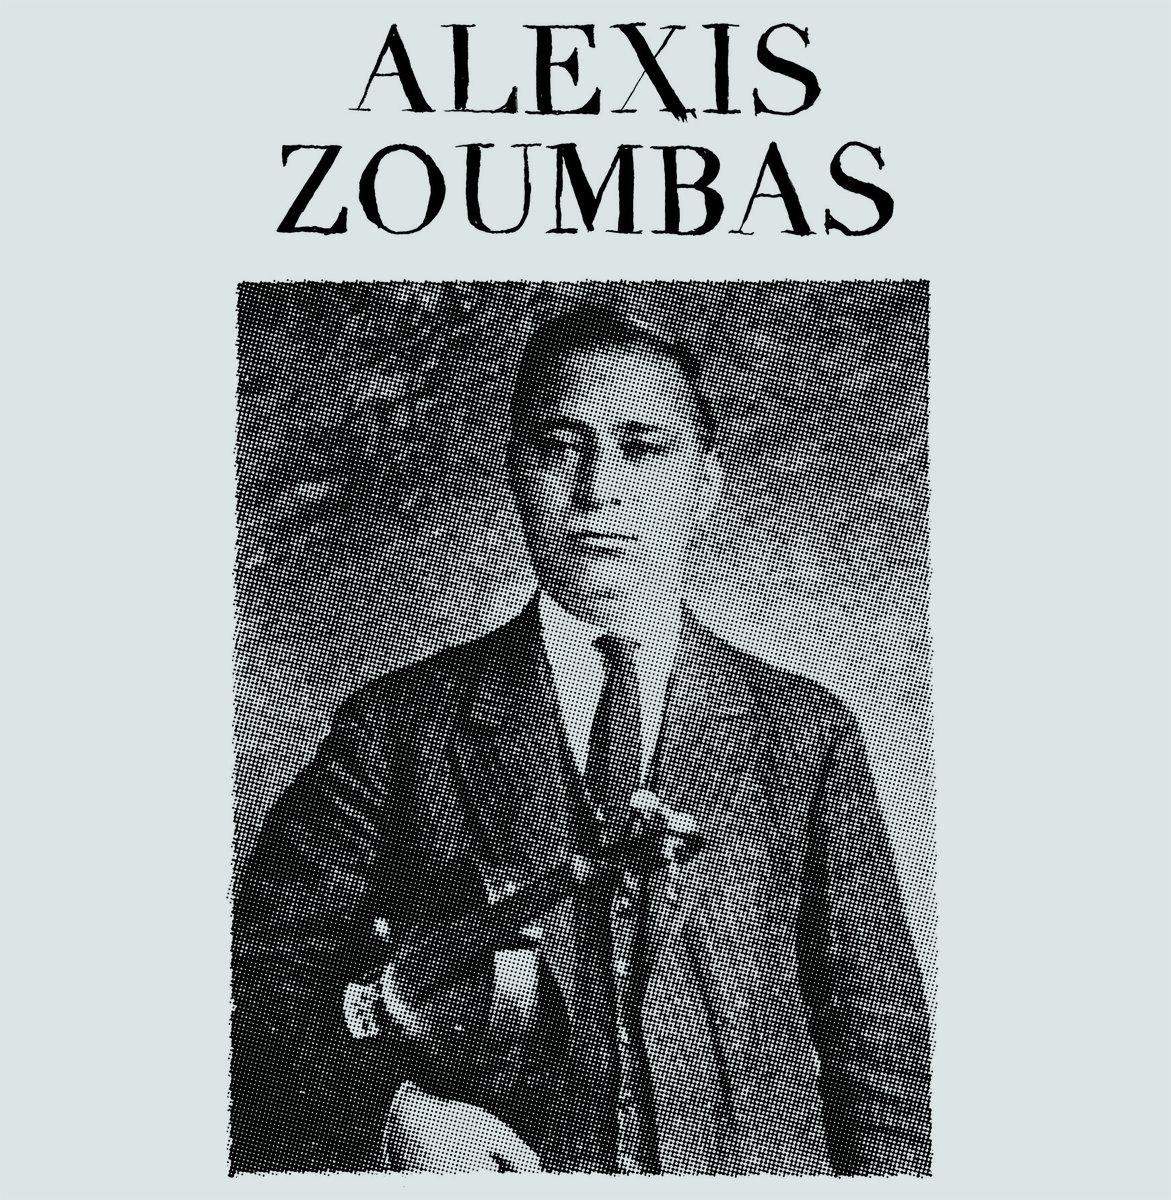 Alexis Zoumbas-Alexis Zoumbas  Release Date: August 15, 2019 Label: Olvido Records  SERVICE: Mastering, Restoration NUMBER OF DISCS: 1 GENRE: Greek FORMAT: LP